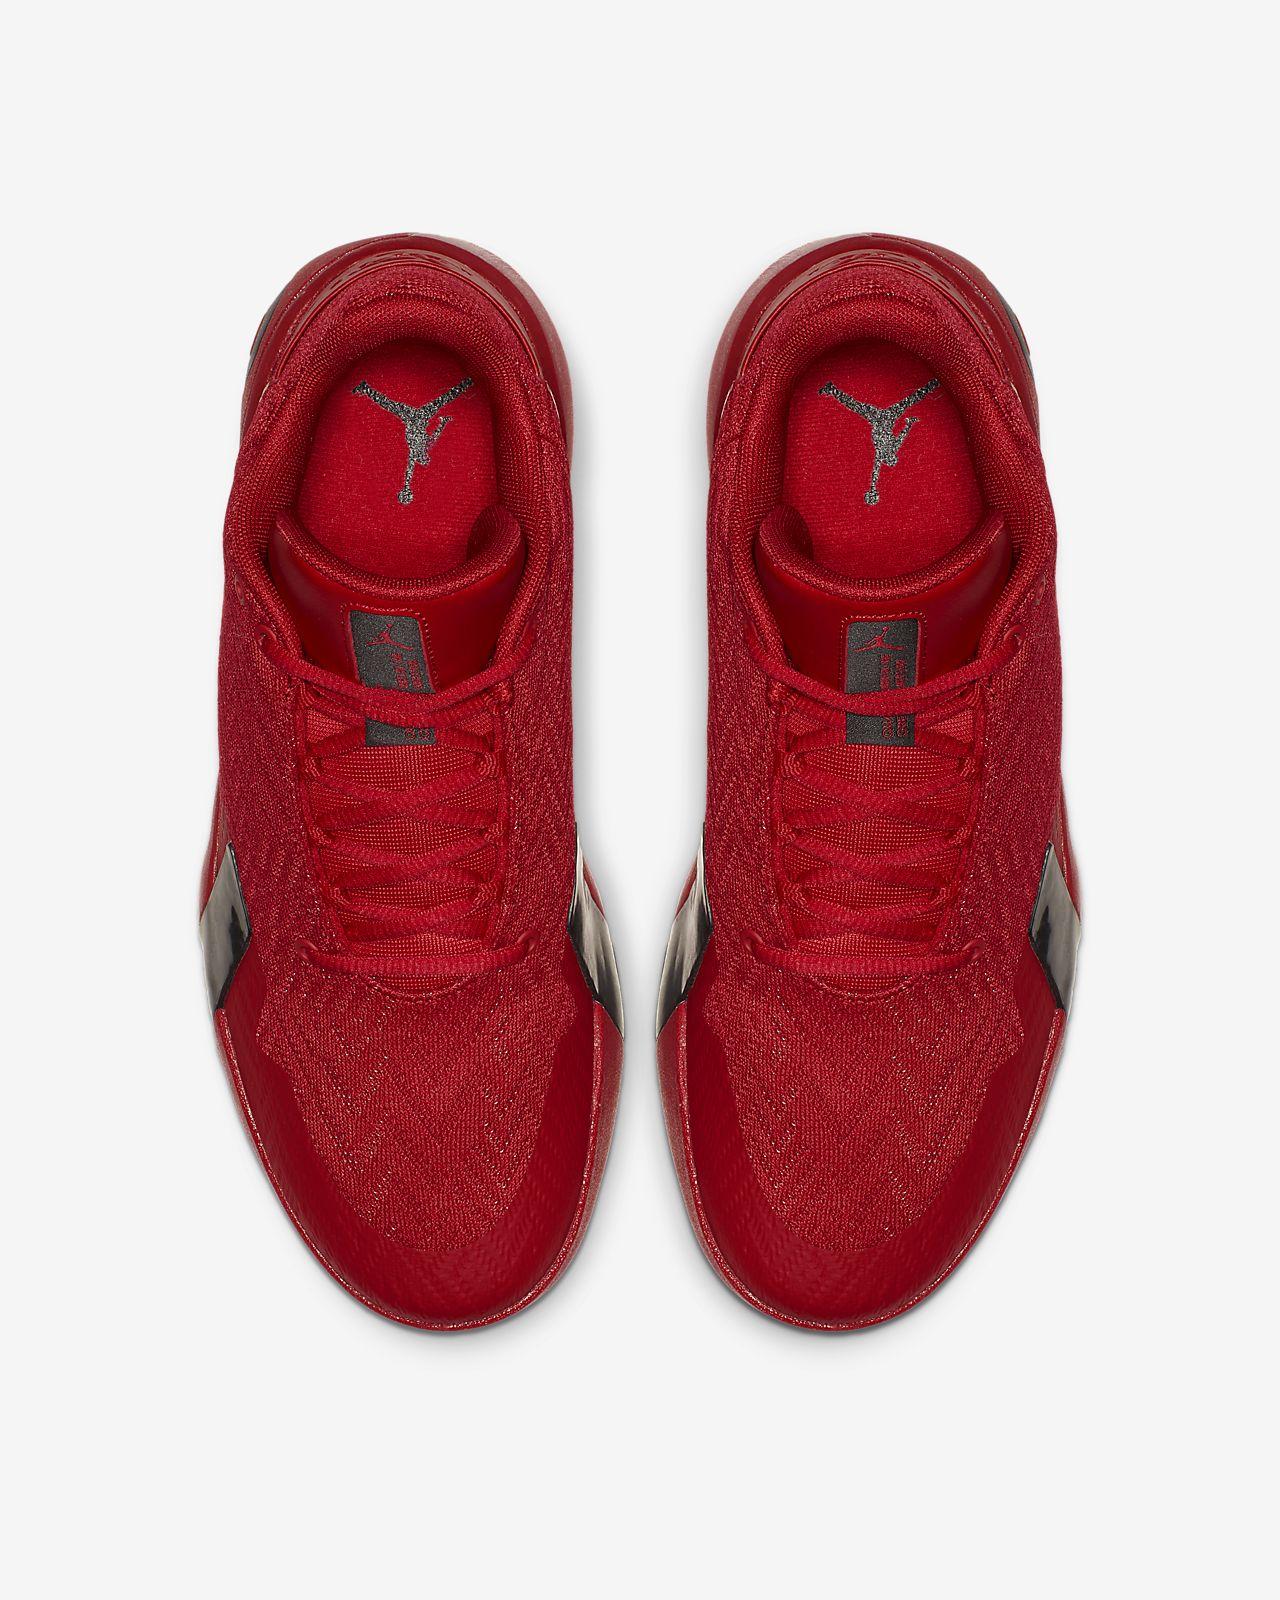 finest selection 91e1d f025b ... Jordan Ultra Fly 3 Low Basketball Shoe